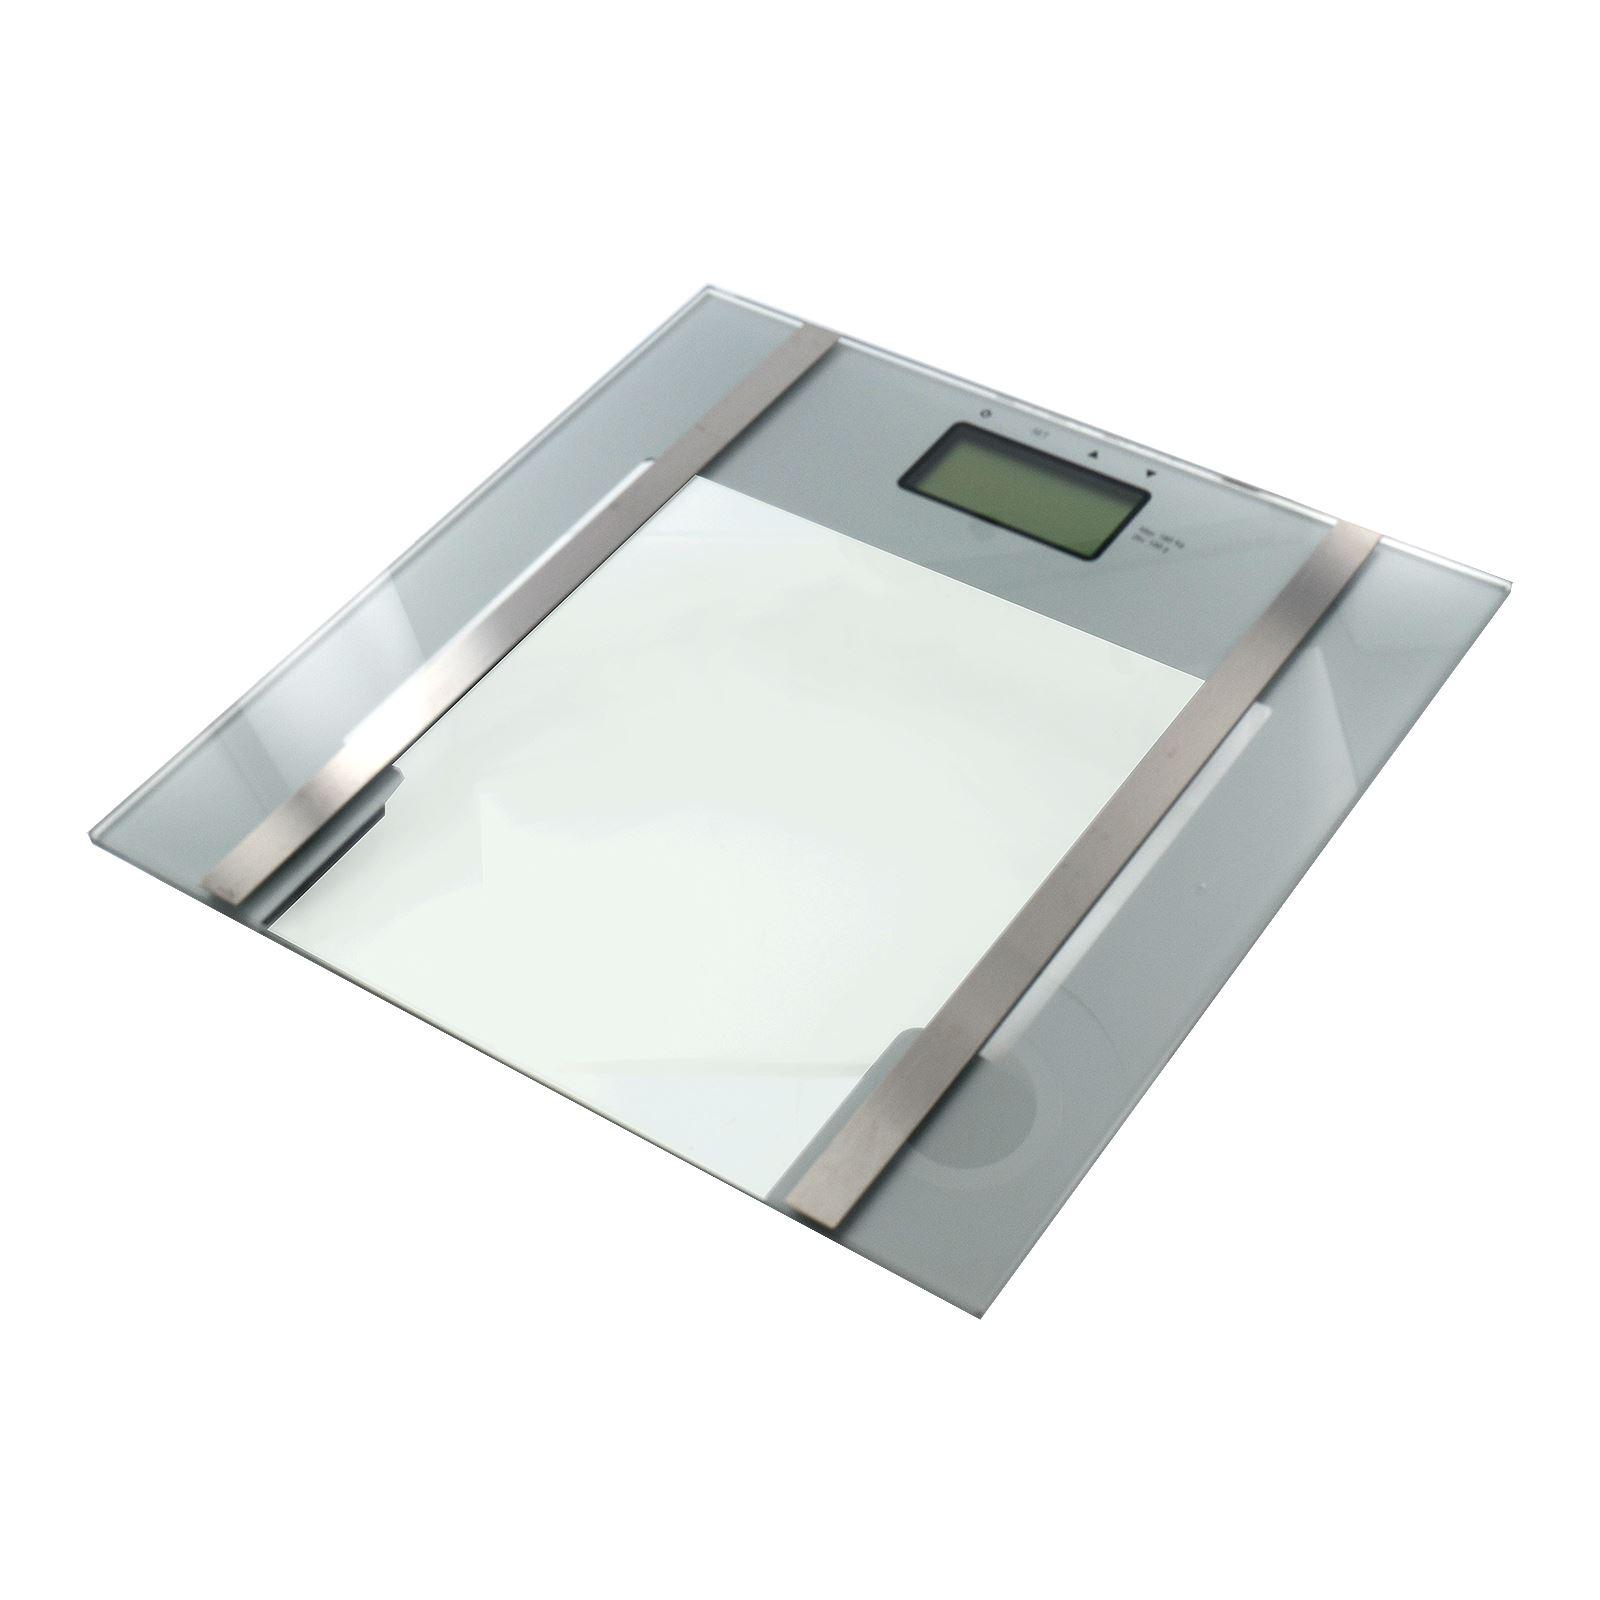 Bmi Bathroom Scale: CCV 180kg Digital BMI Calorie Glass Bathroom Scales Body